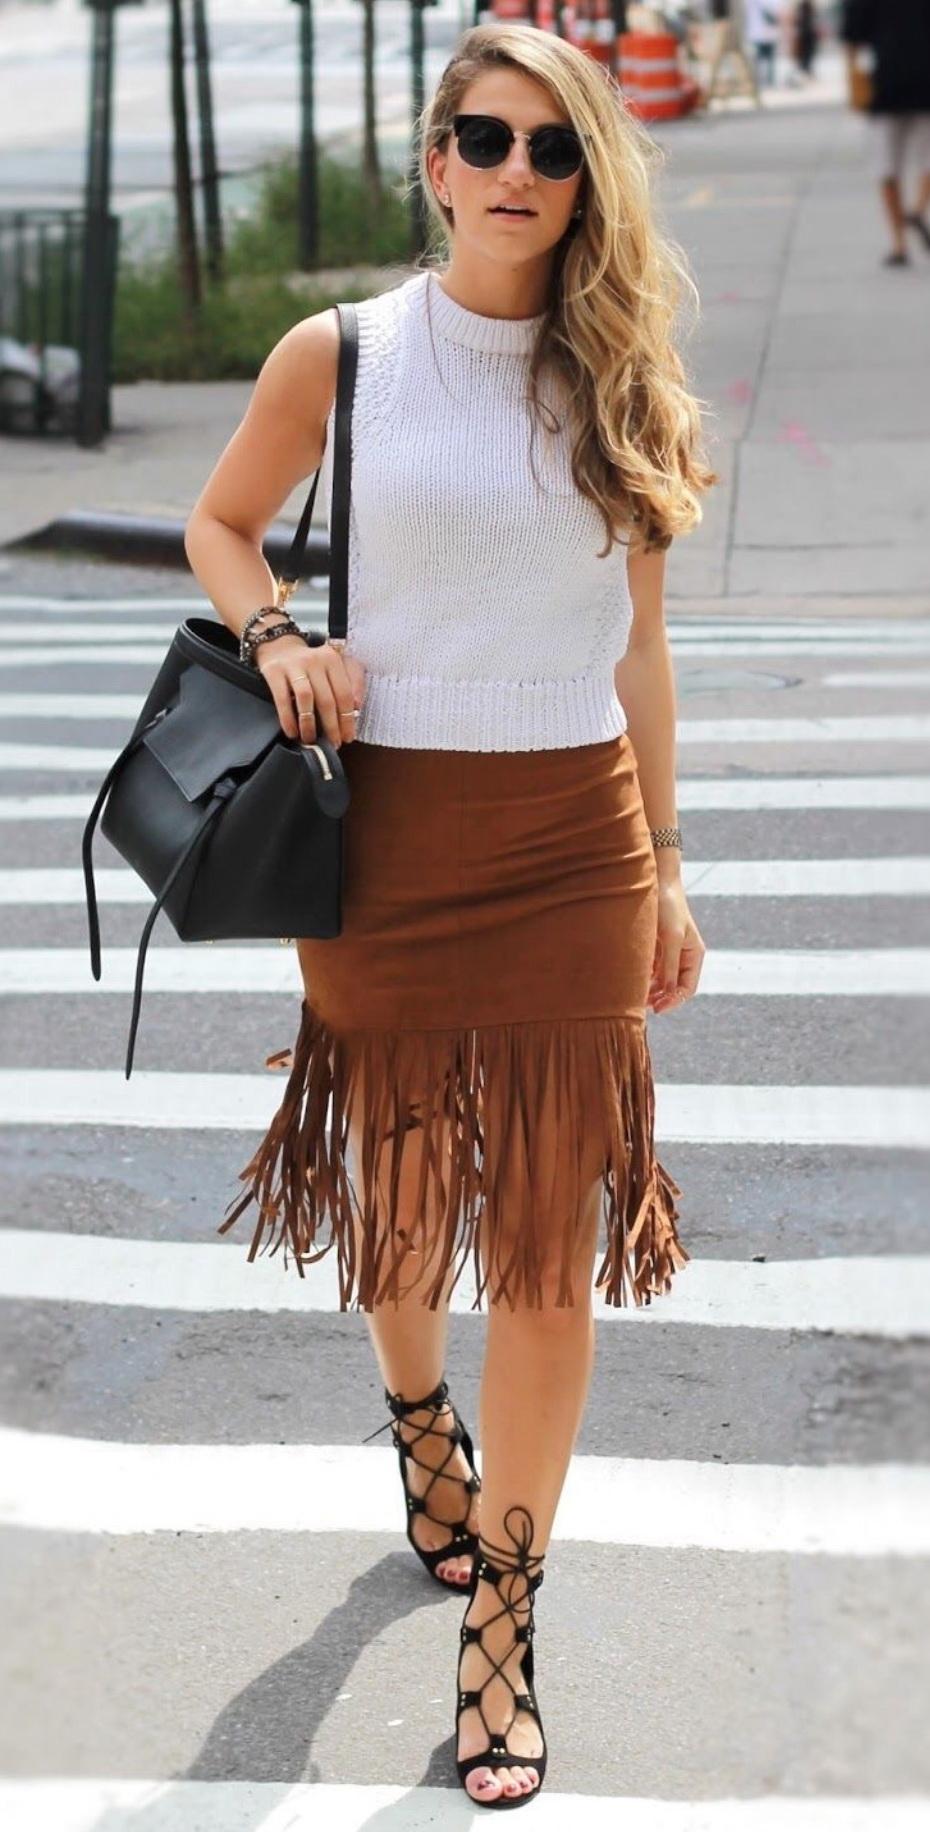 http://2.bp.blogspot.com/-9IJ62Bh2jbs/VeNb-Xt15RI/AAAAAAAADD8/cLGJQYOkvNE/s1600/forever21-fringe-skirt-dressed4dreams_3153%2B%25282%2529.JPG